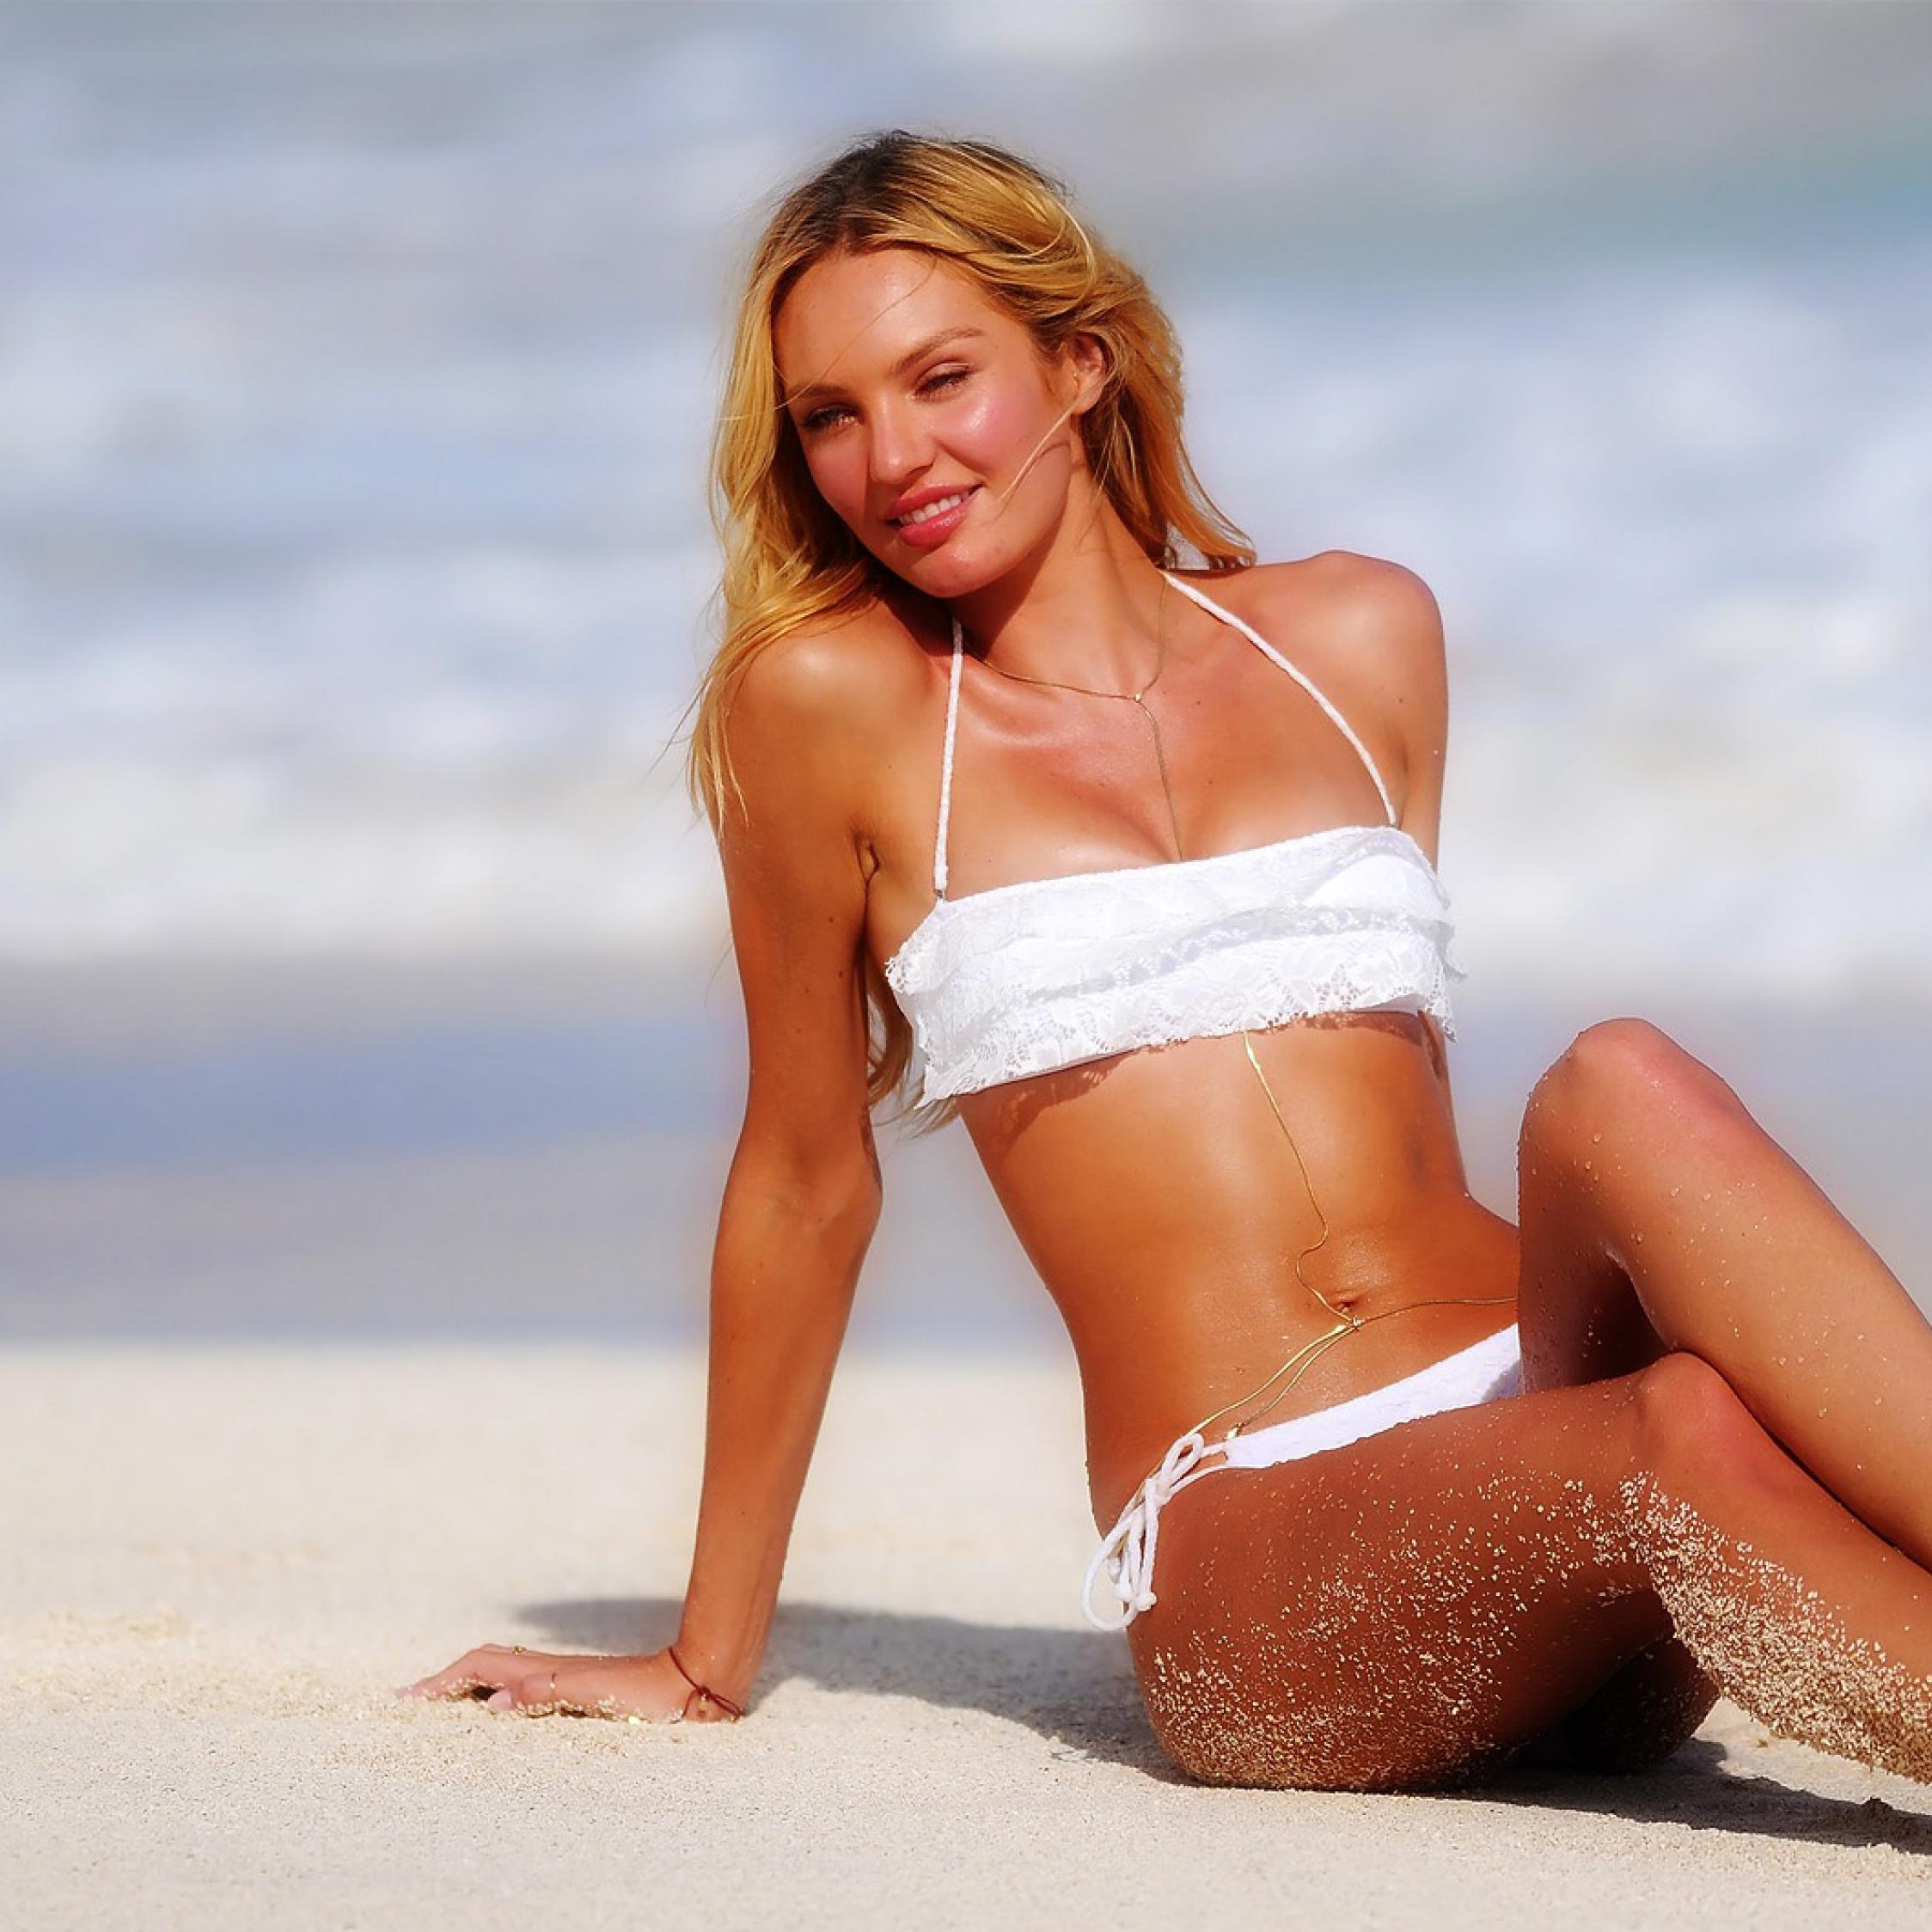 Download Candice Swanepoel Hot Bikini Photoshoot 960x544